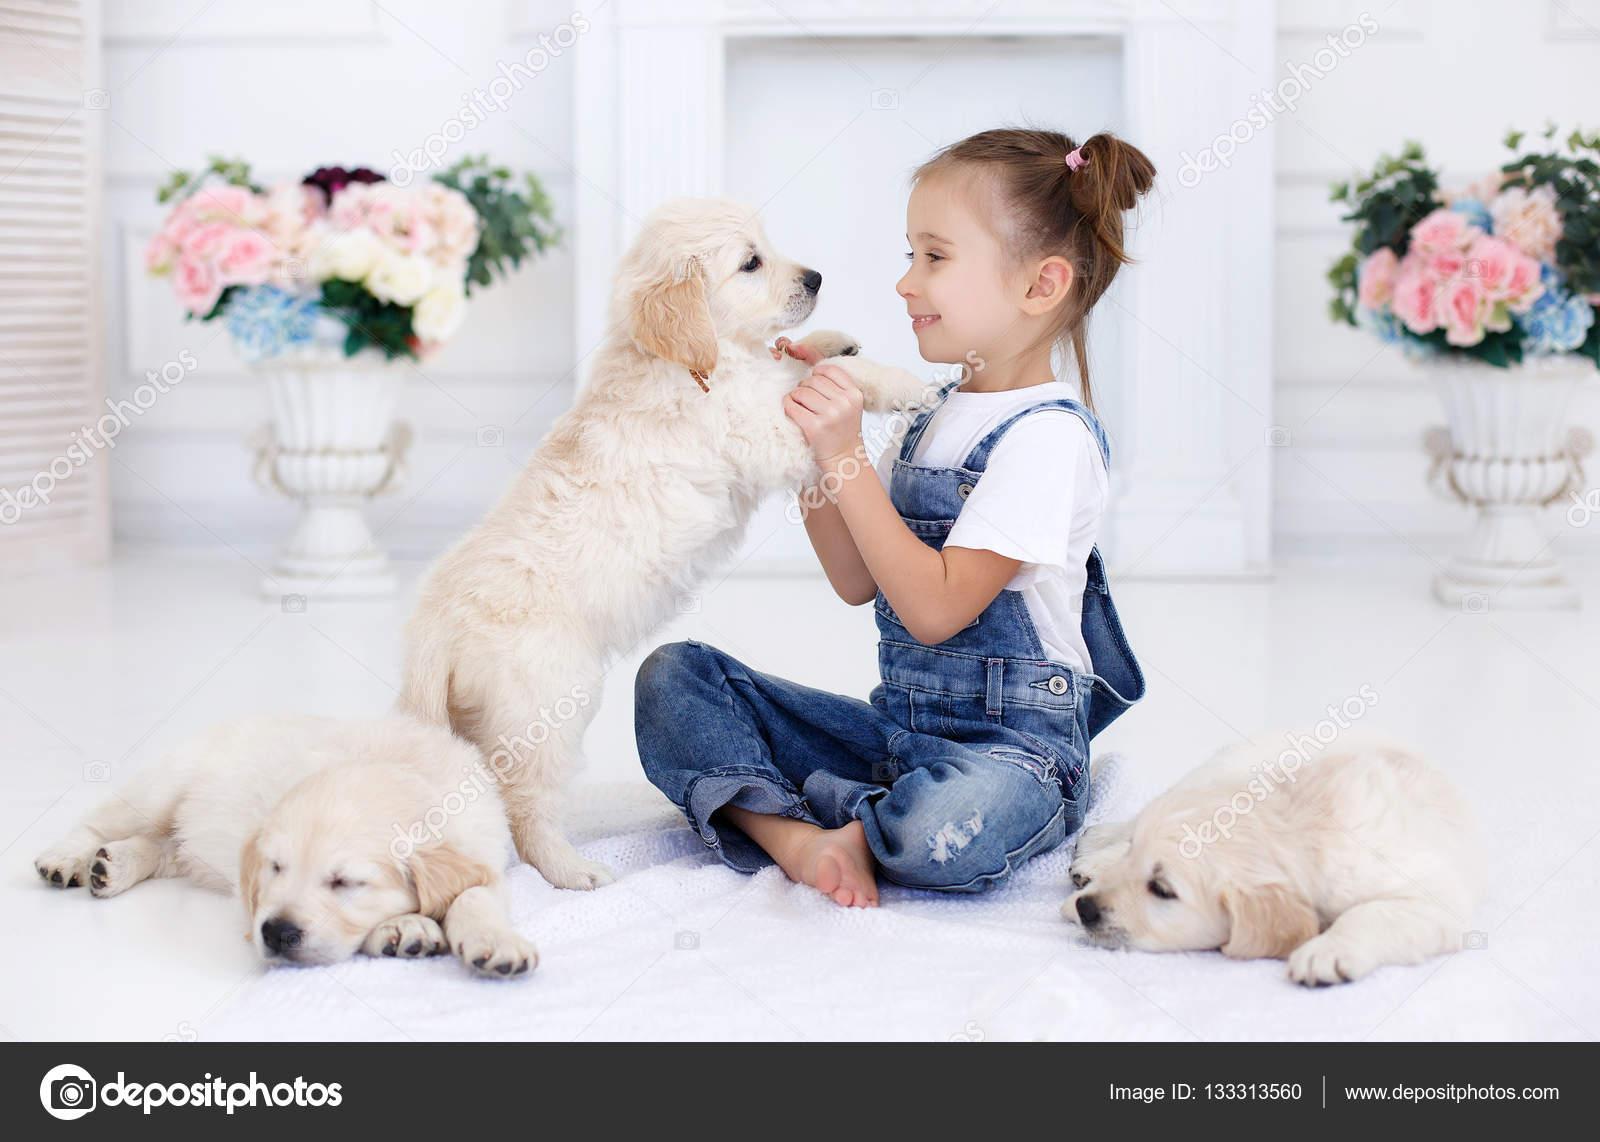 Ребёнок и щенок фото